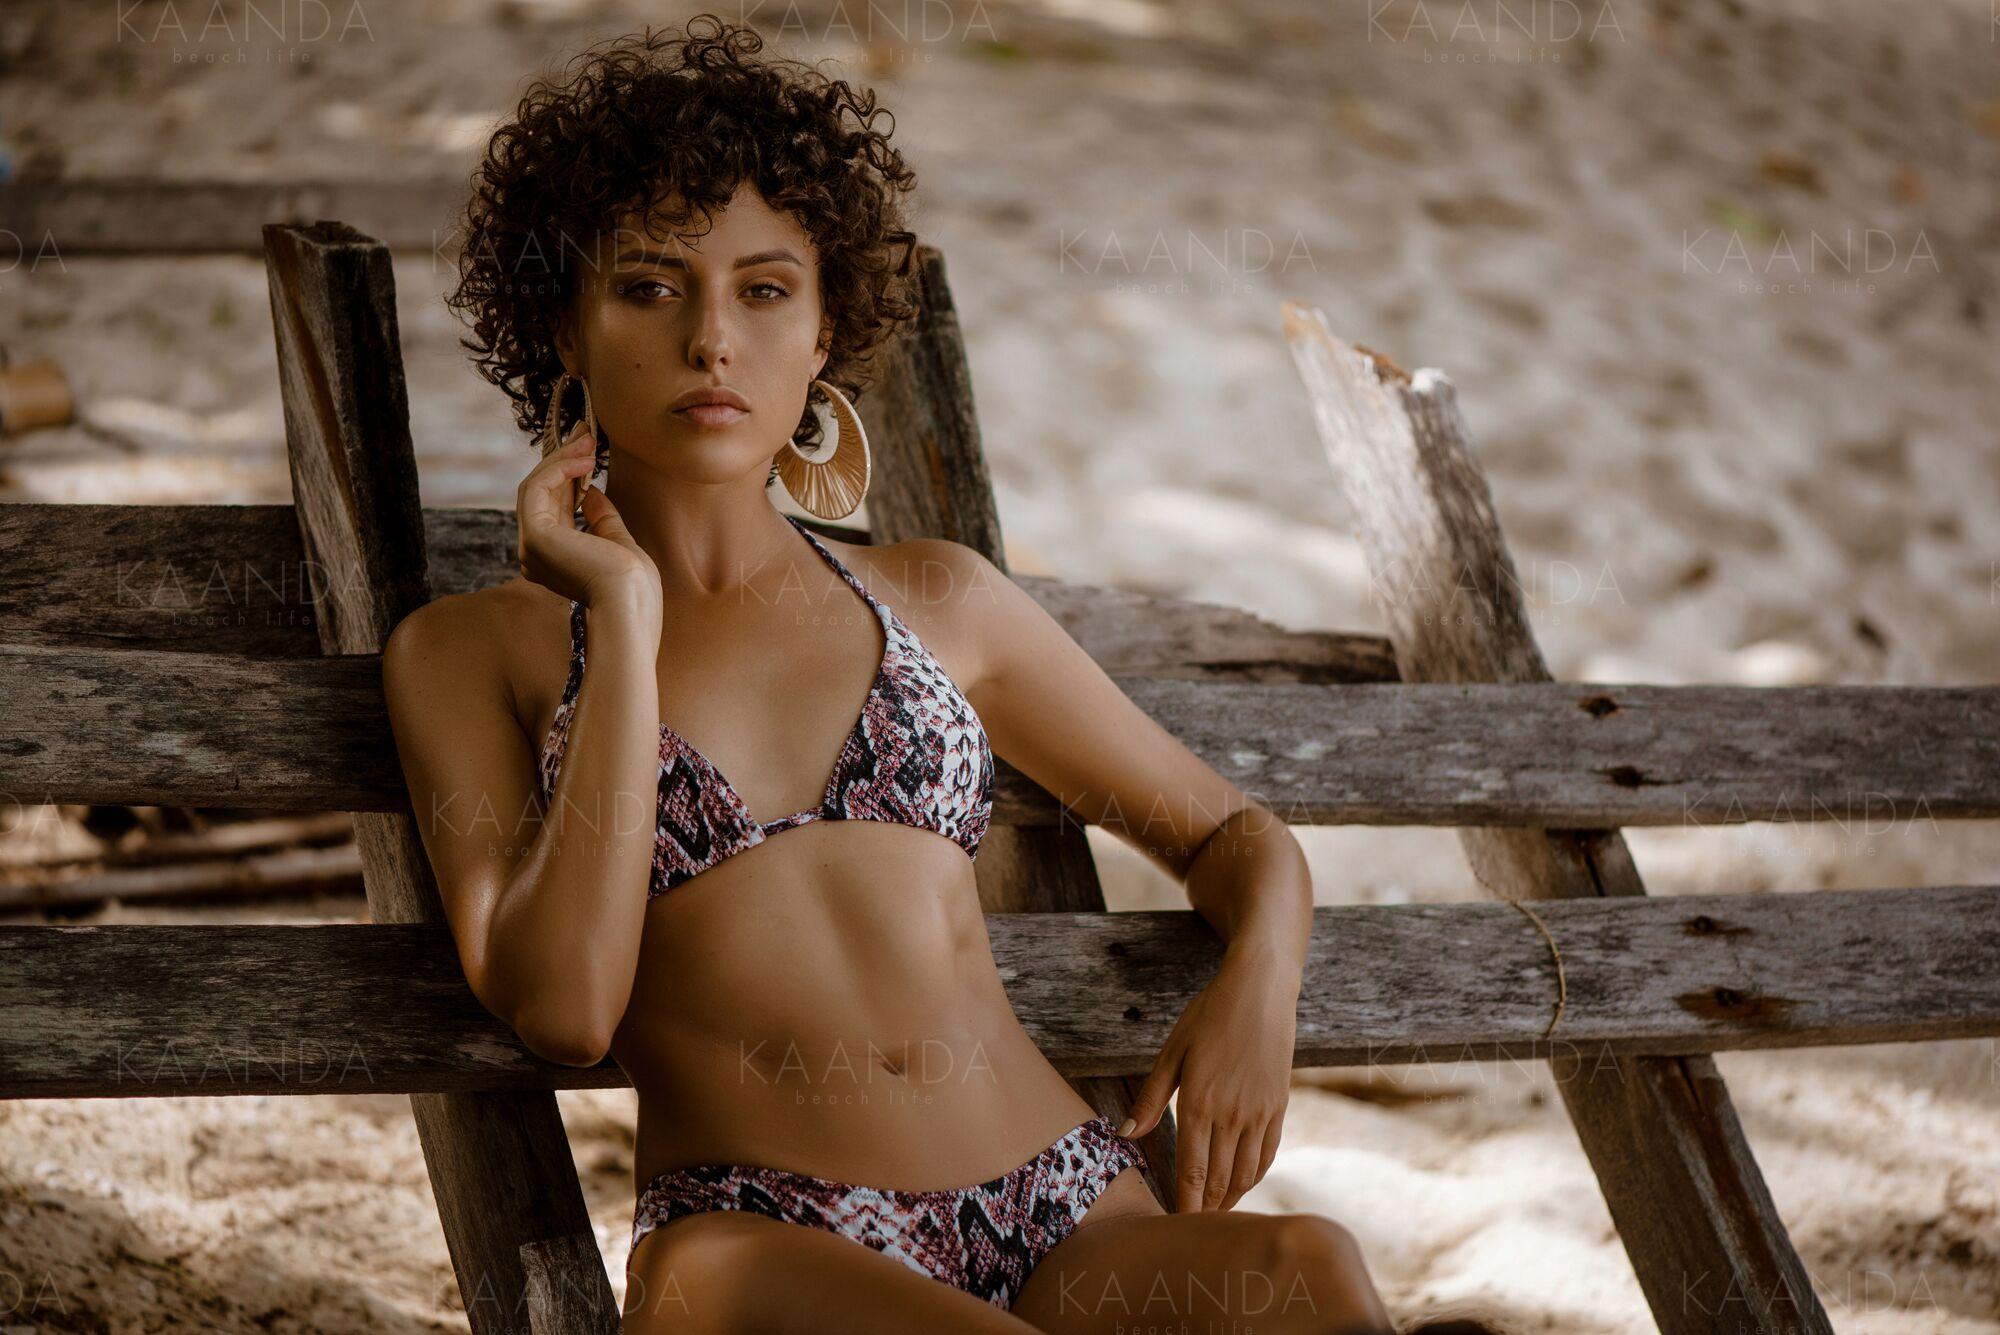 Bikinitop Trekant, Kaanda Beach Life, Stella snake Surf